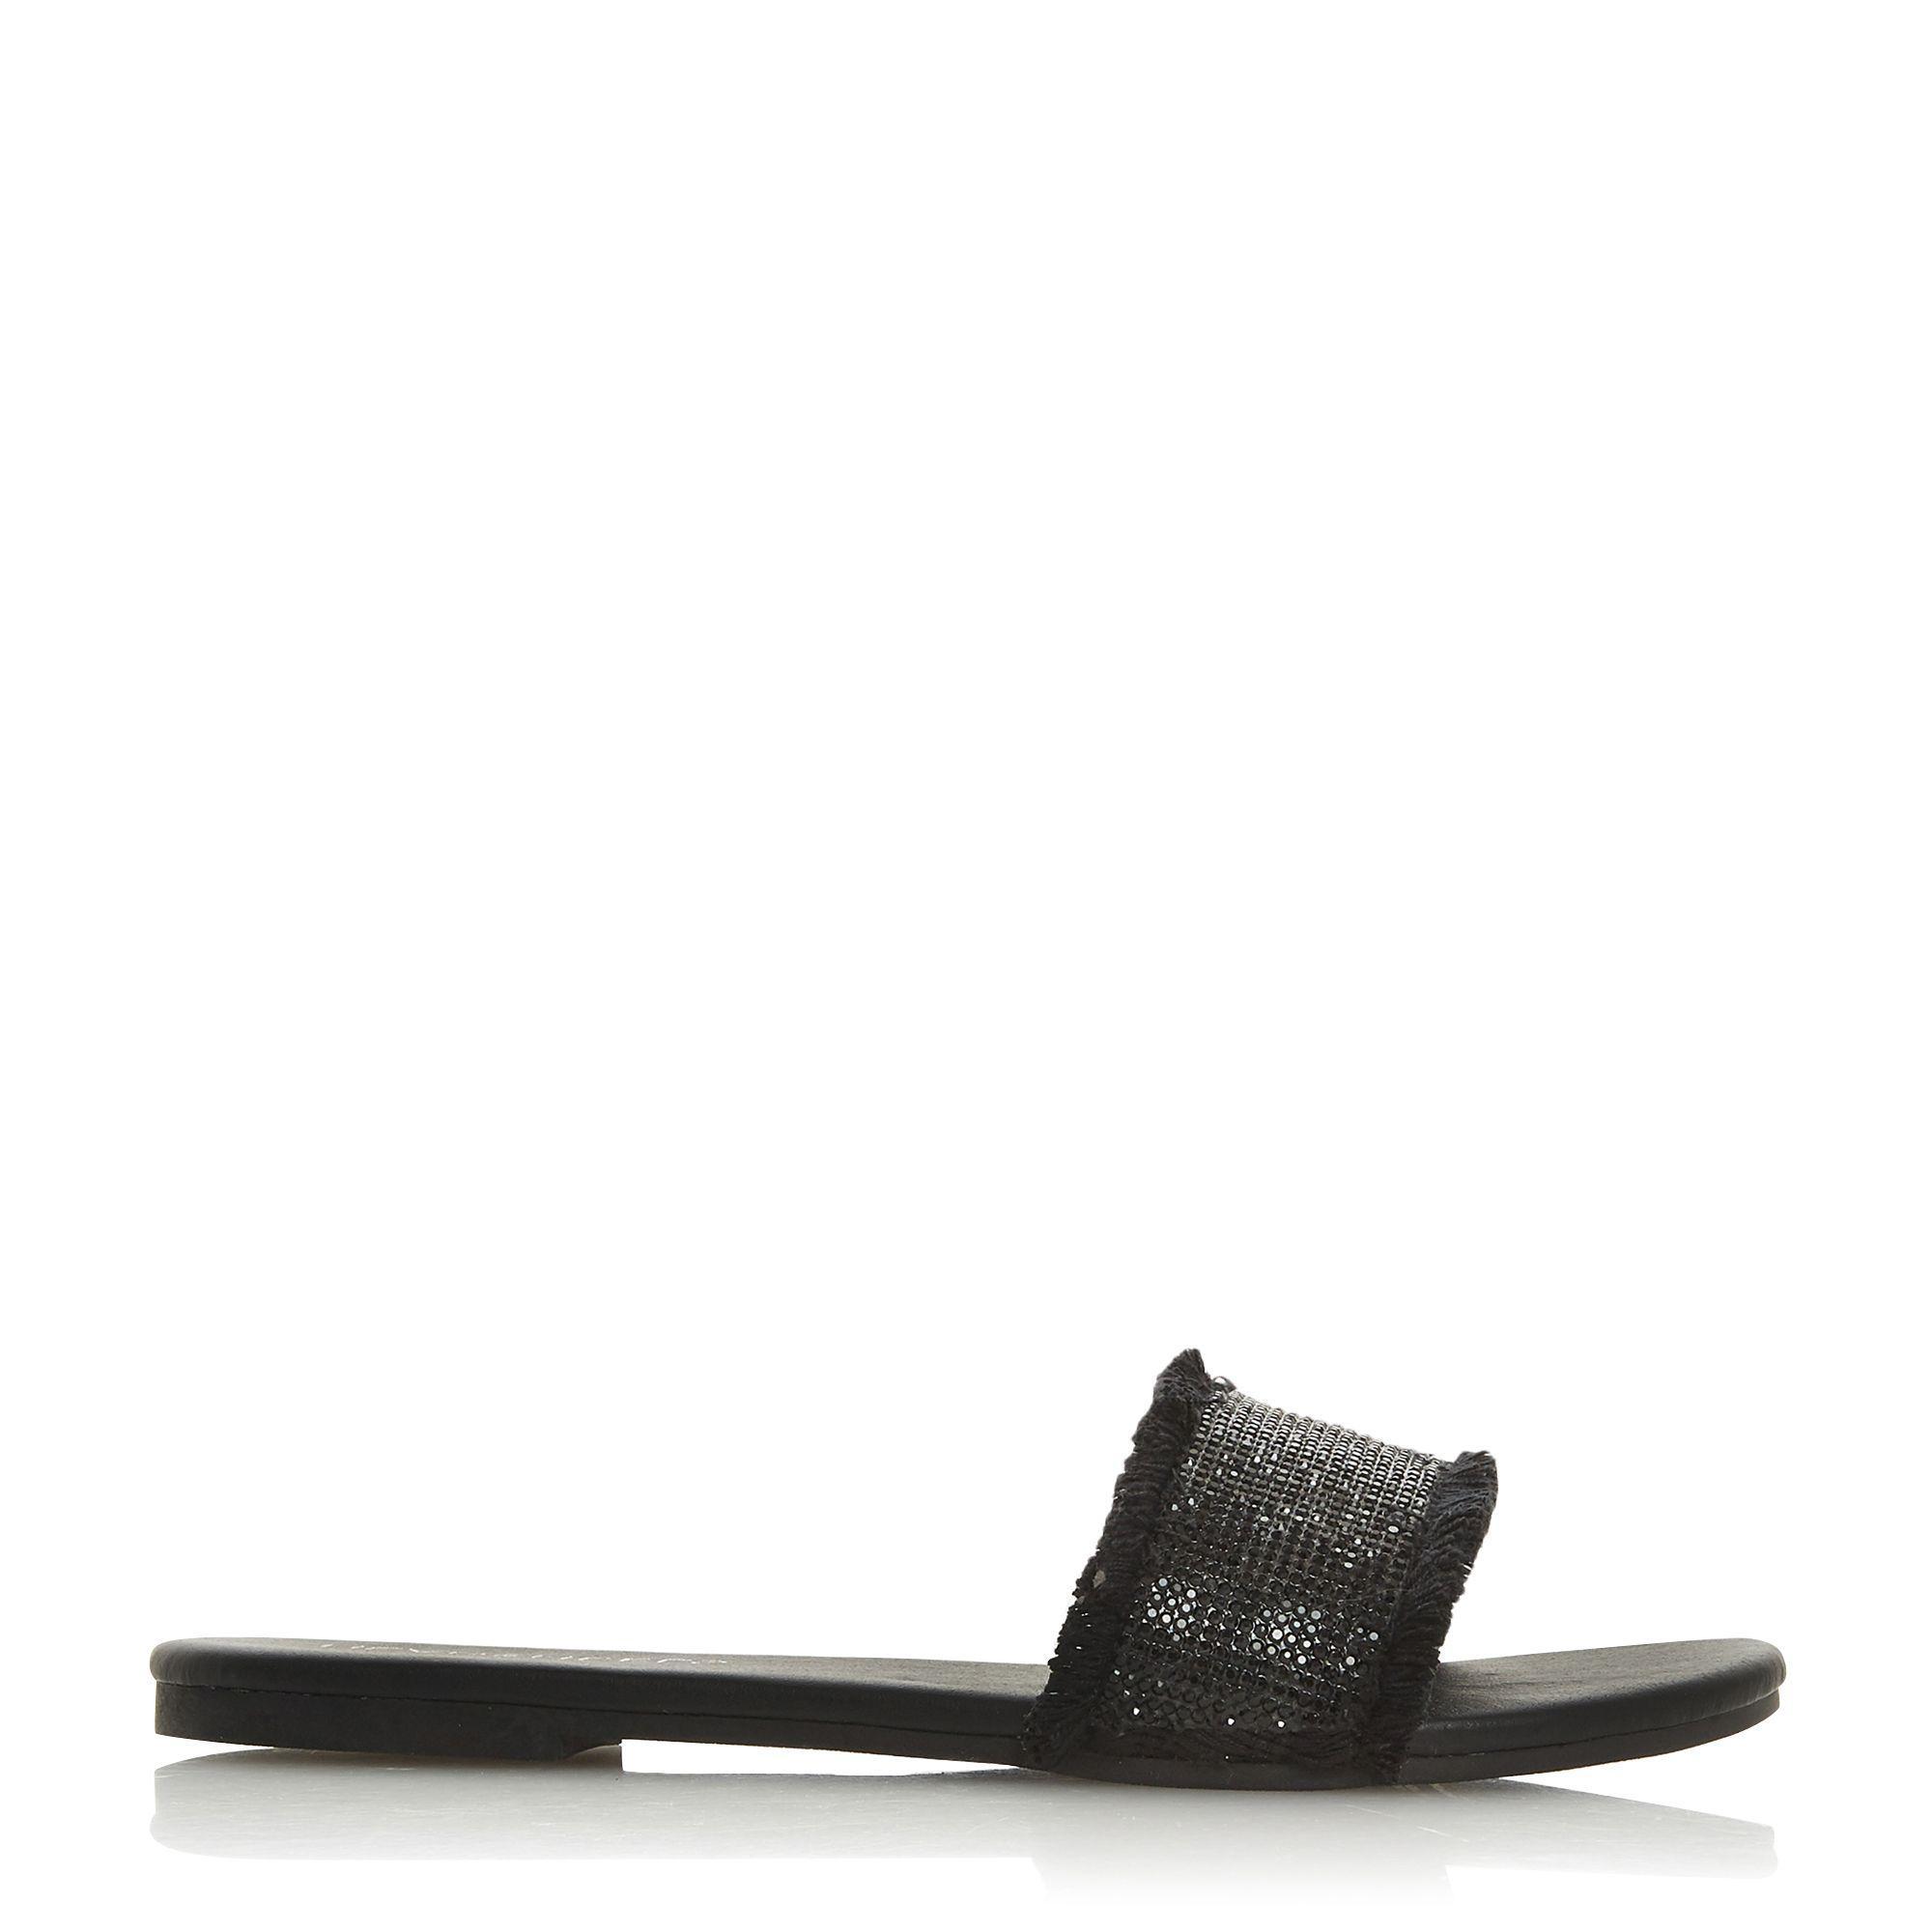 84cc589af2e Dune Black 'ladyy' Mule Slippers in Black - Lyst